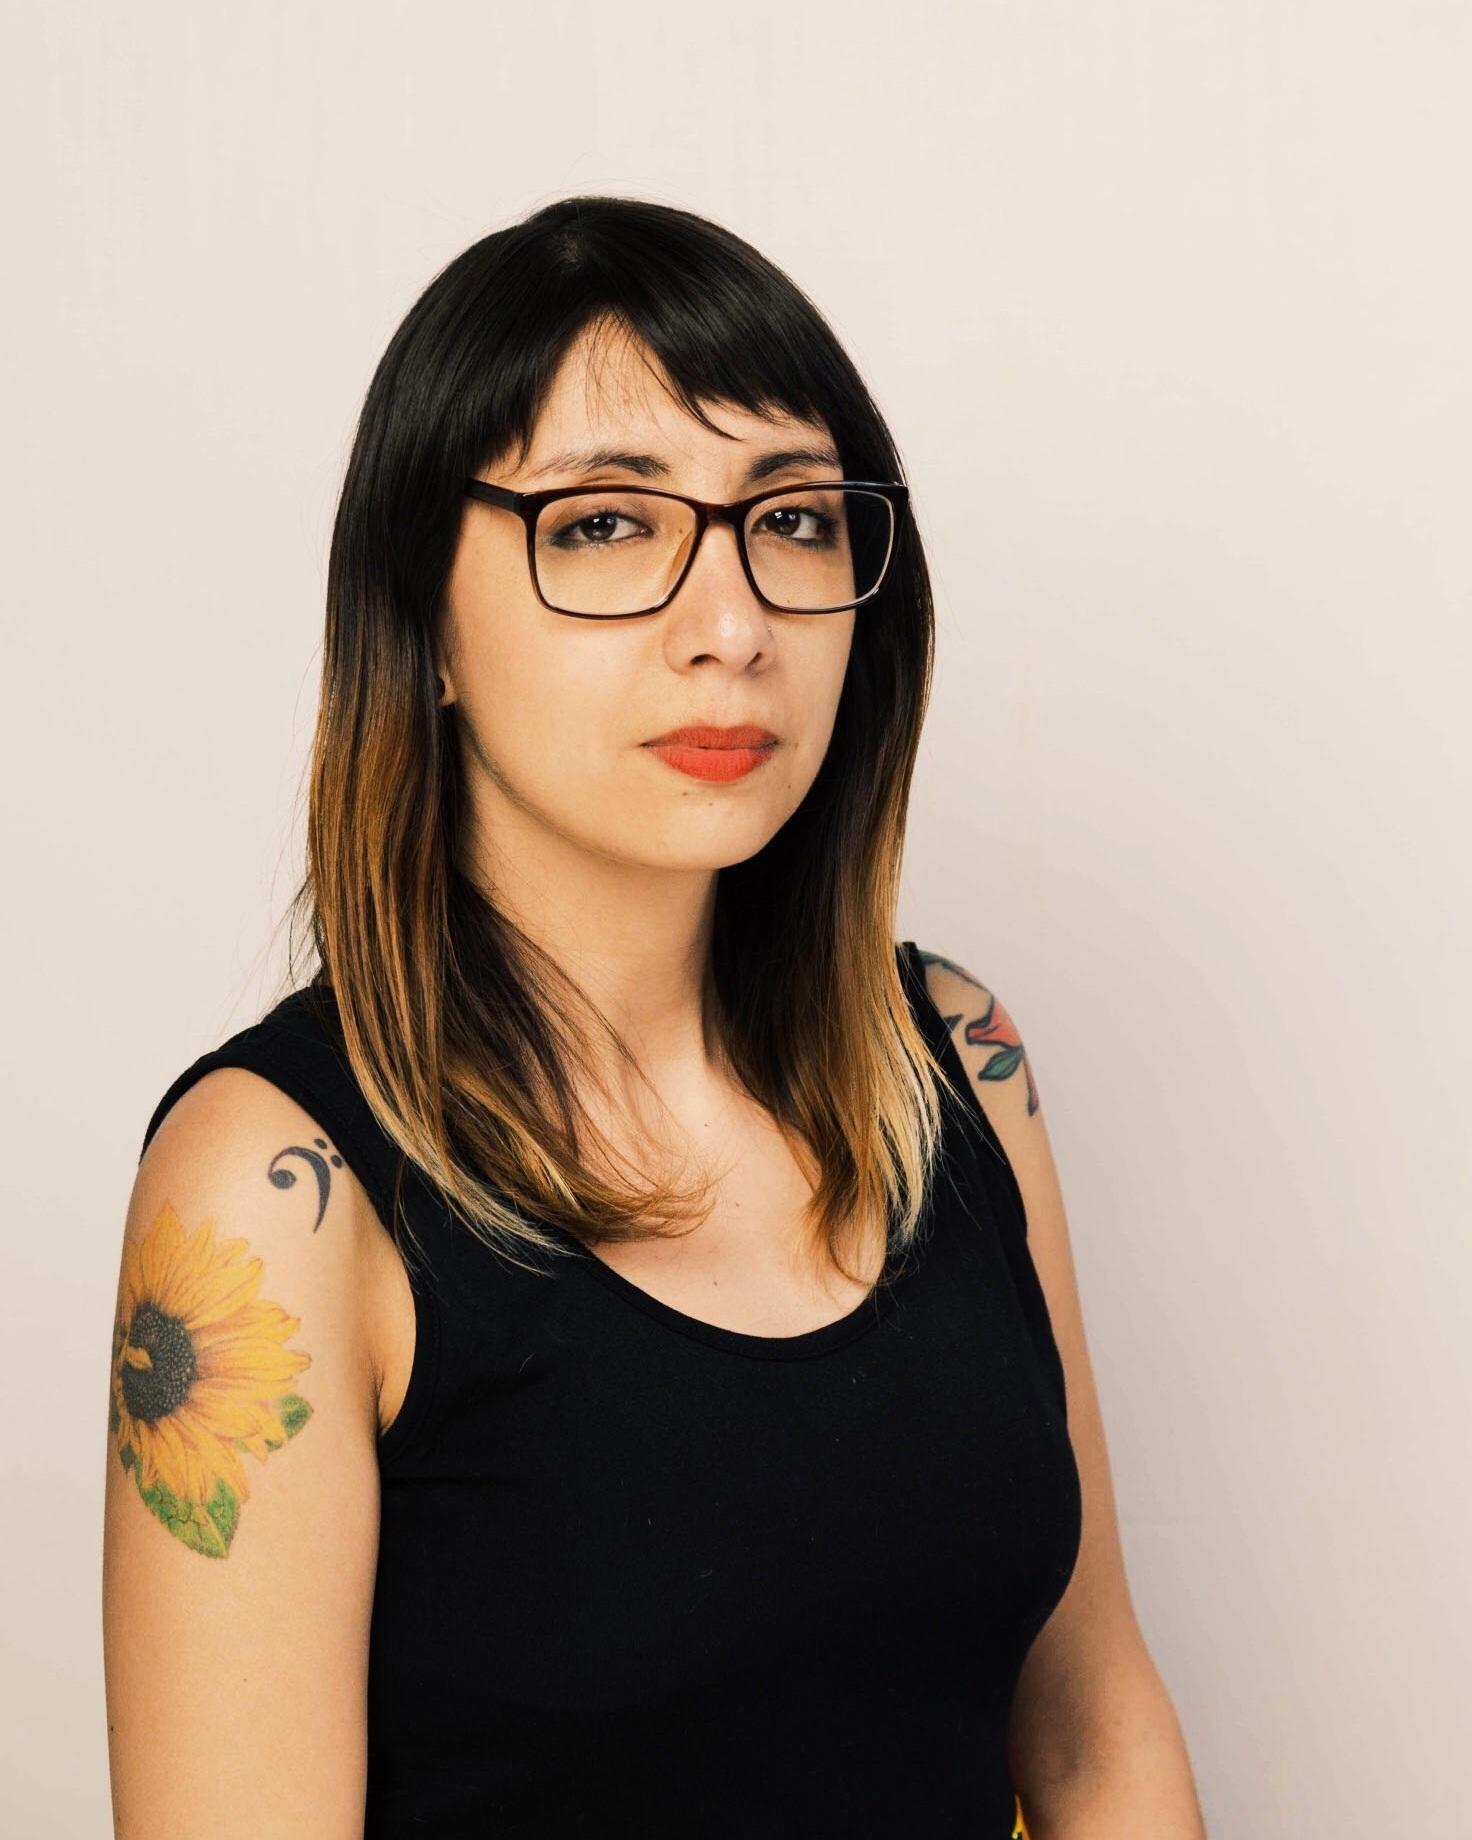 Beatriz Margarita Leal Ramos